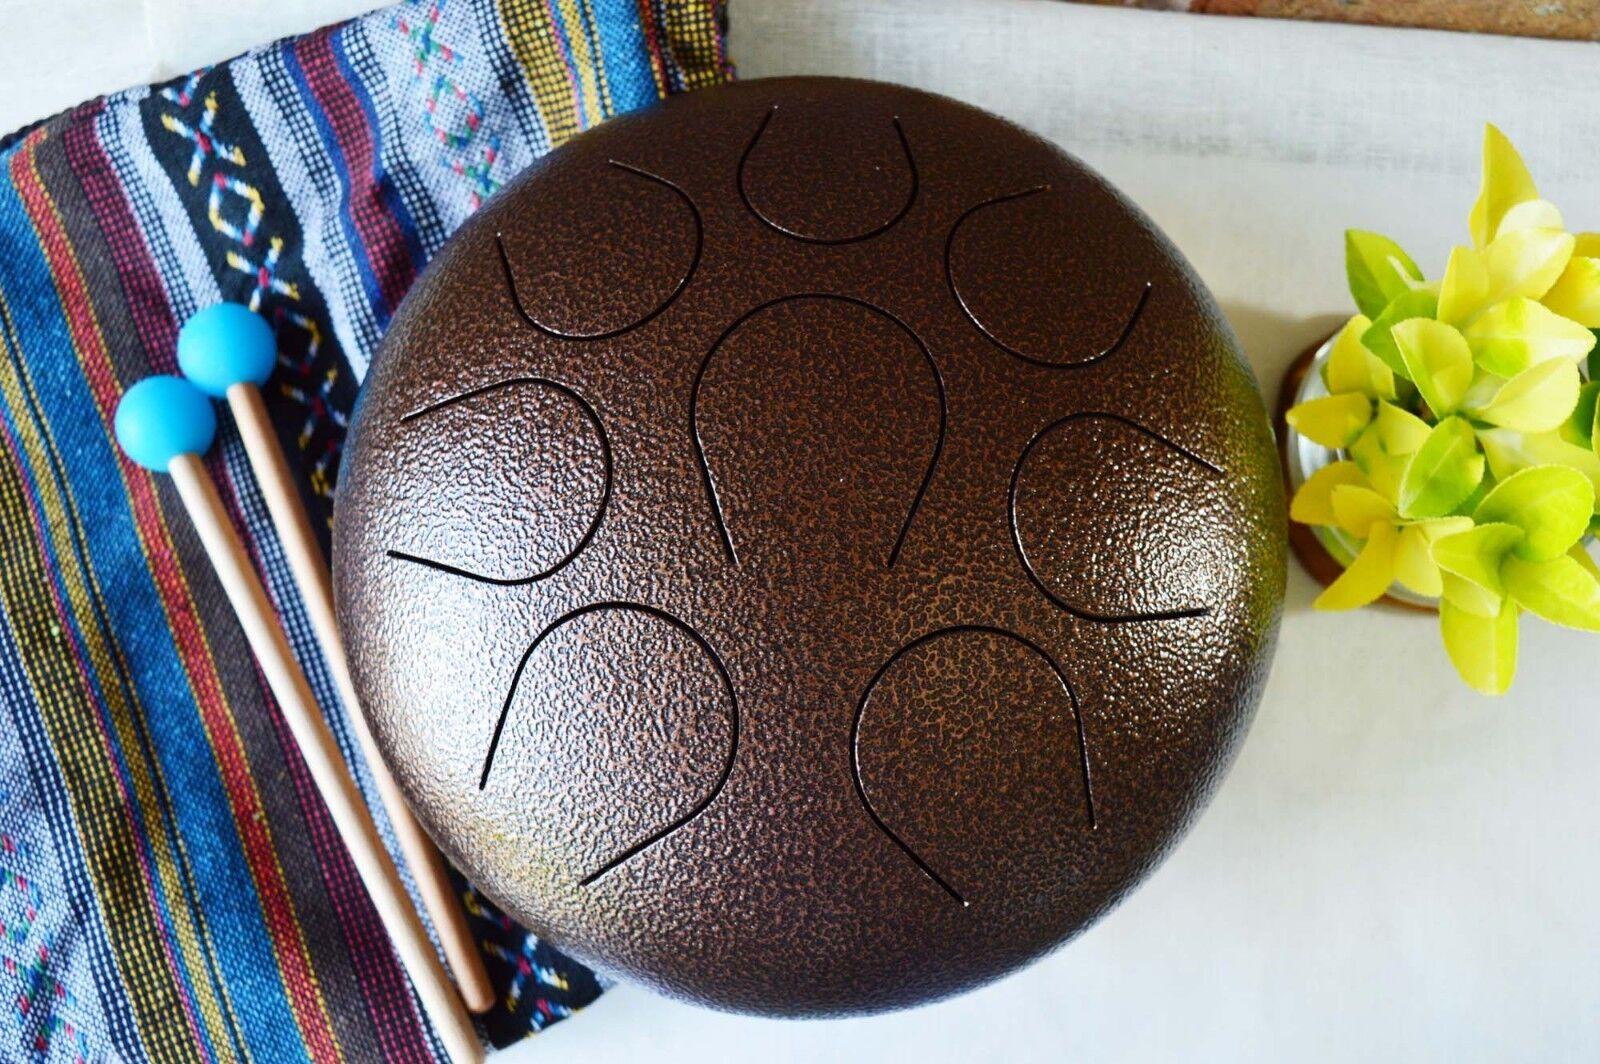 Hand pan Wuyou 10in Steel Tongue Tank Handpan Drum meditation Healing sound drum